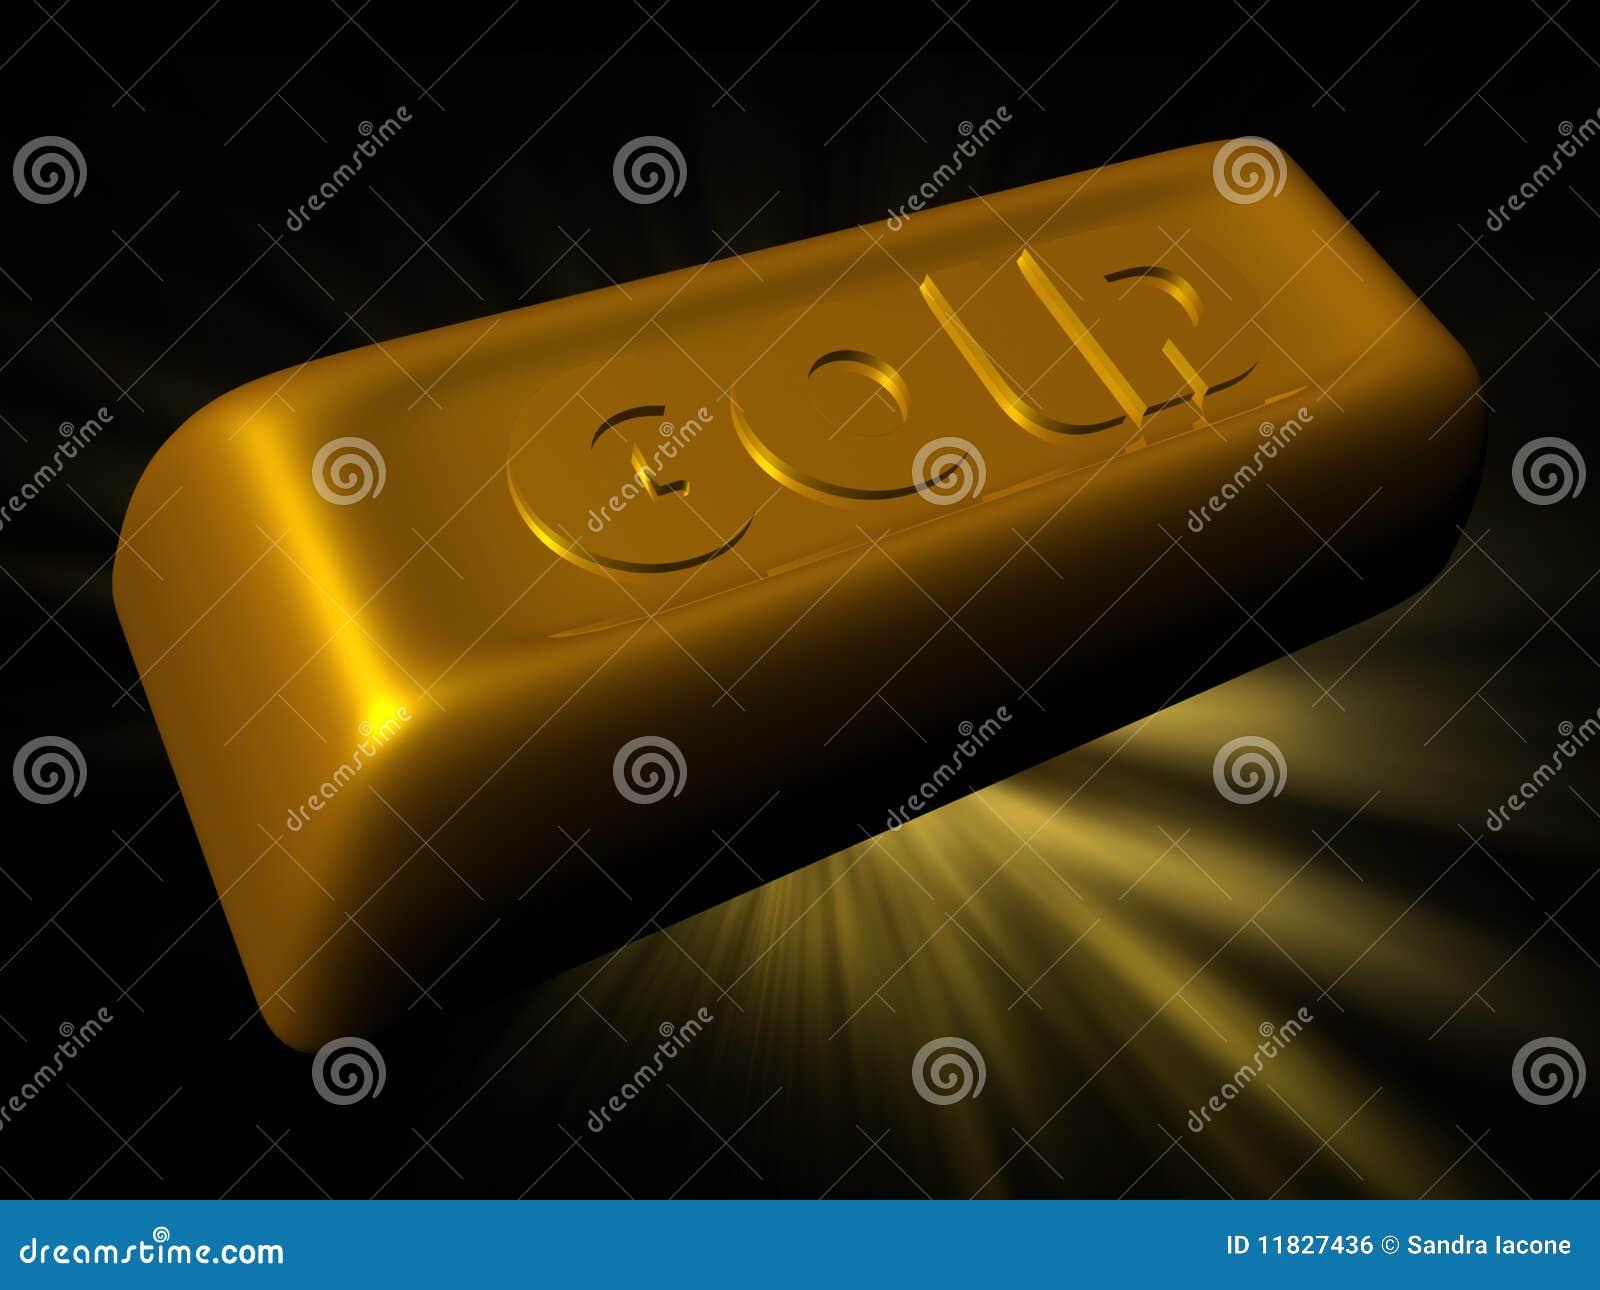 gold bar black background - photo #32